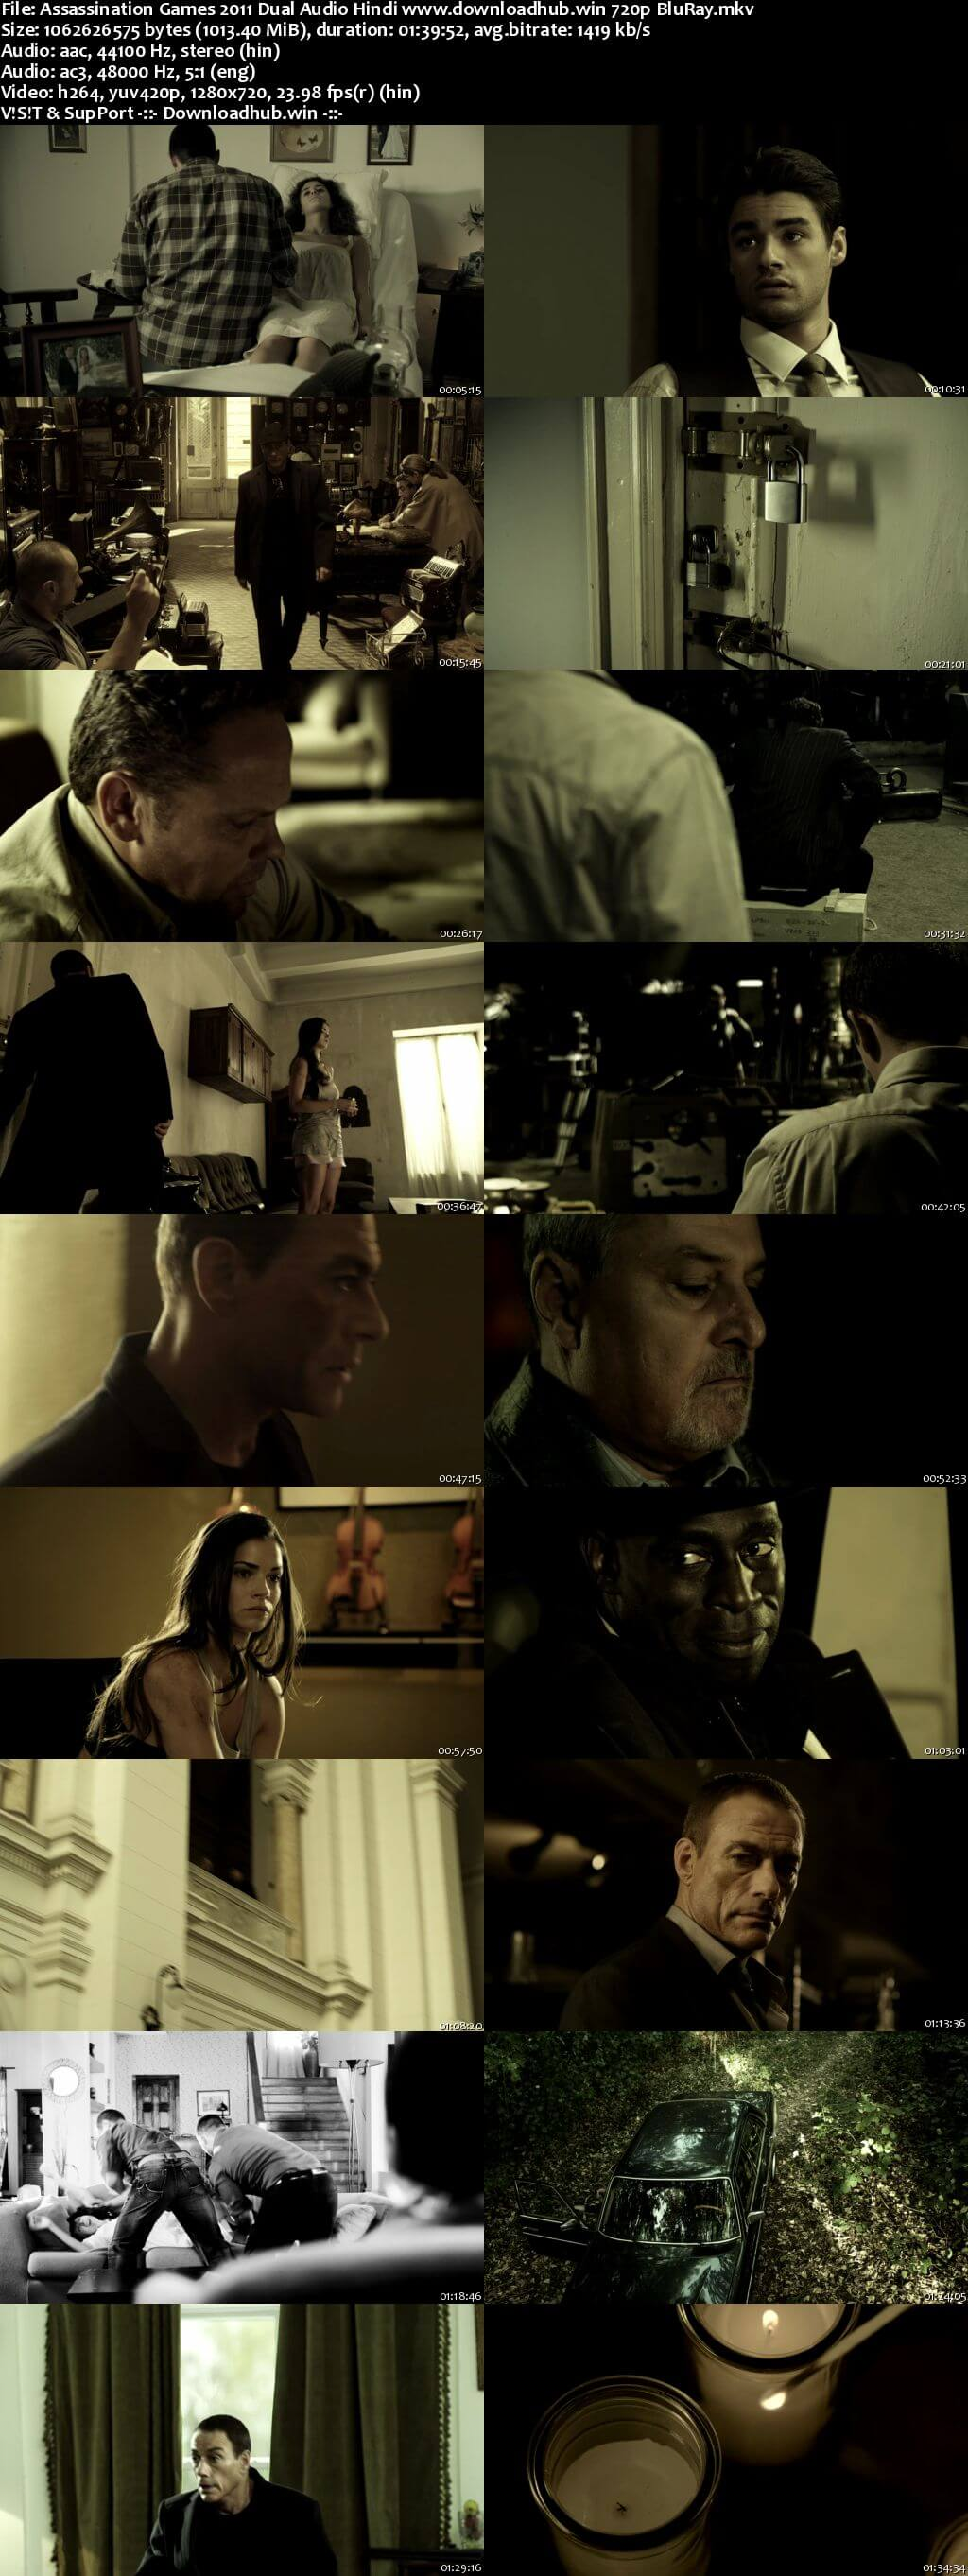 Assassination Games 2011 Hindi Dual Audio 720p BluRay ESubs